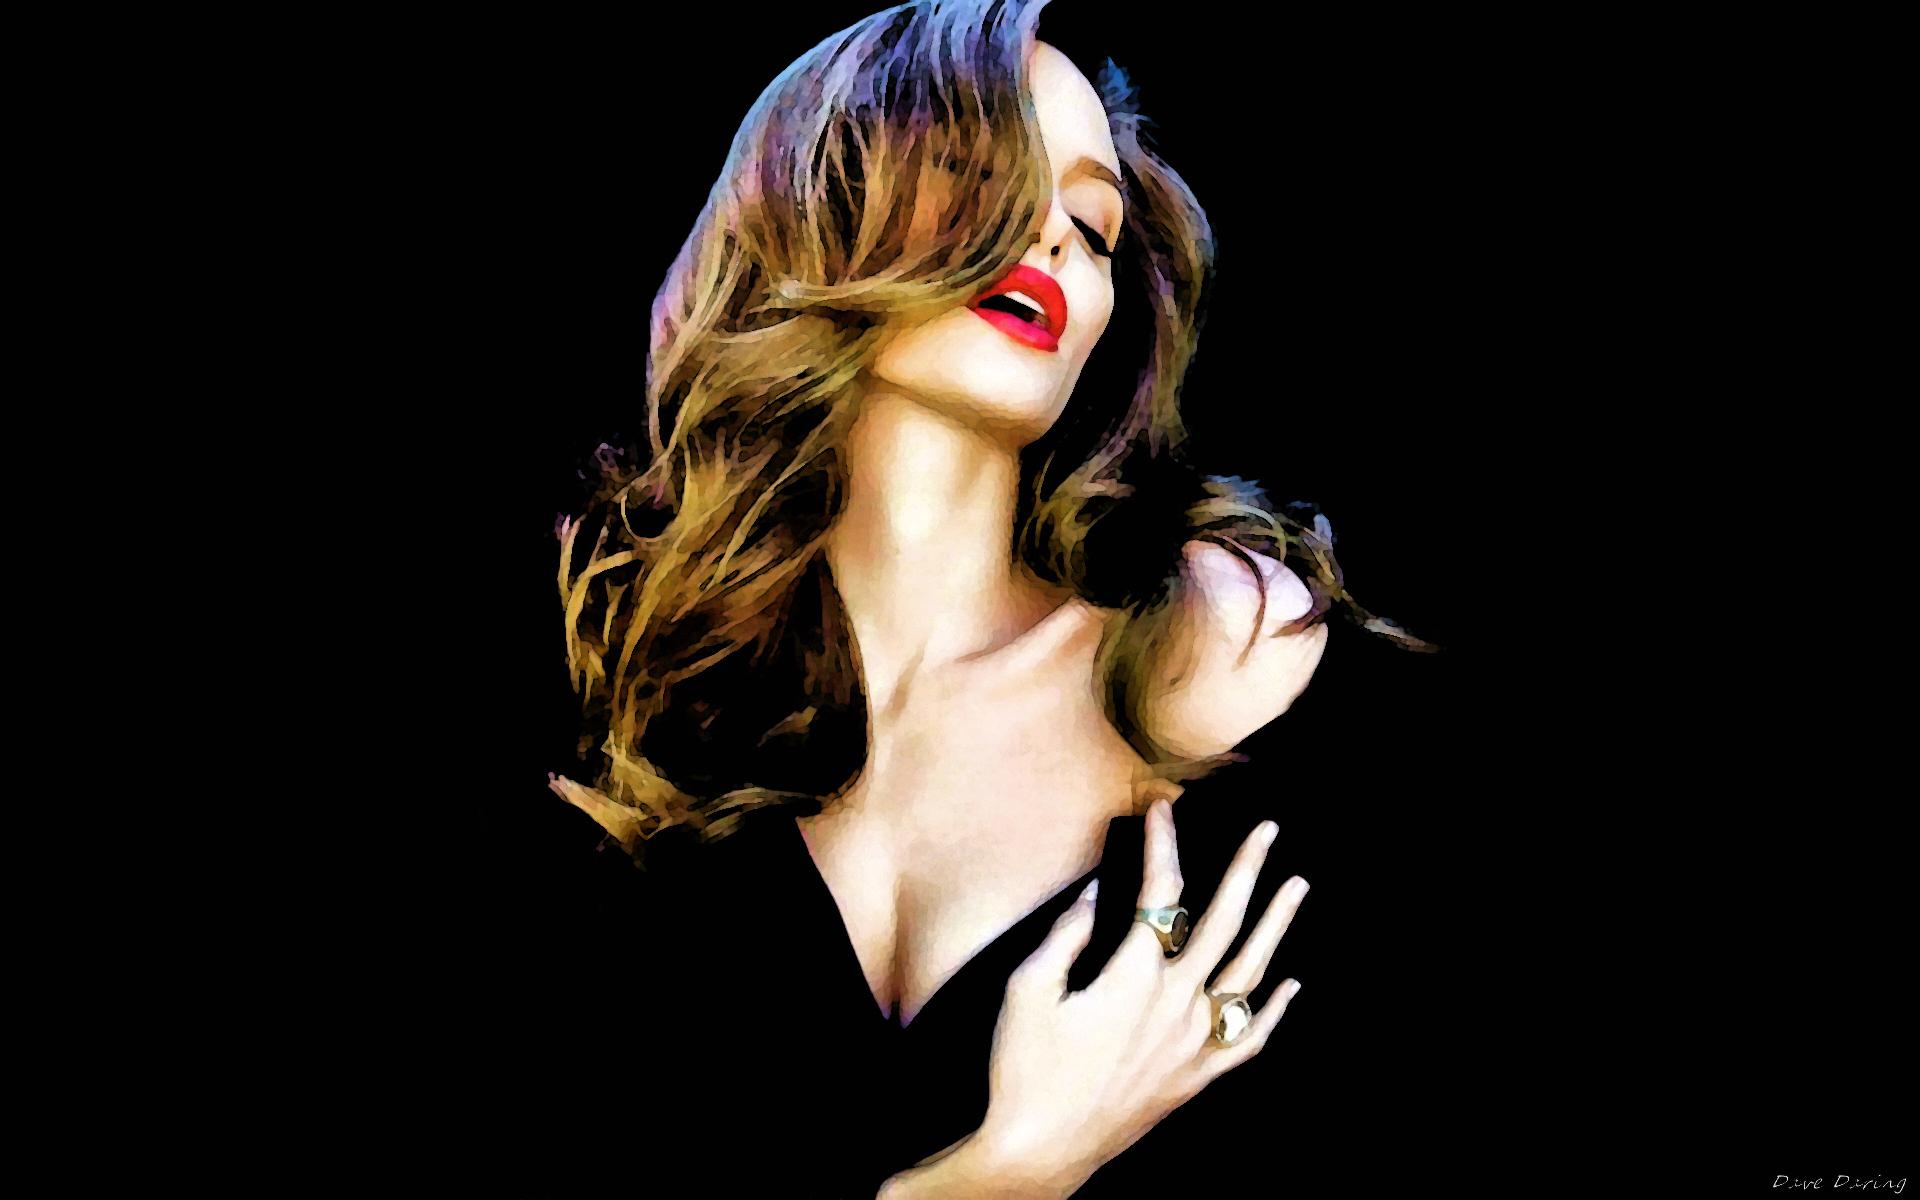 Angelina Jolie (By Night) দেওয়ালপত্র